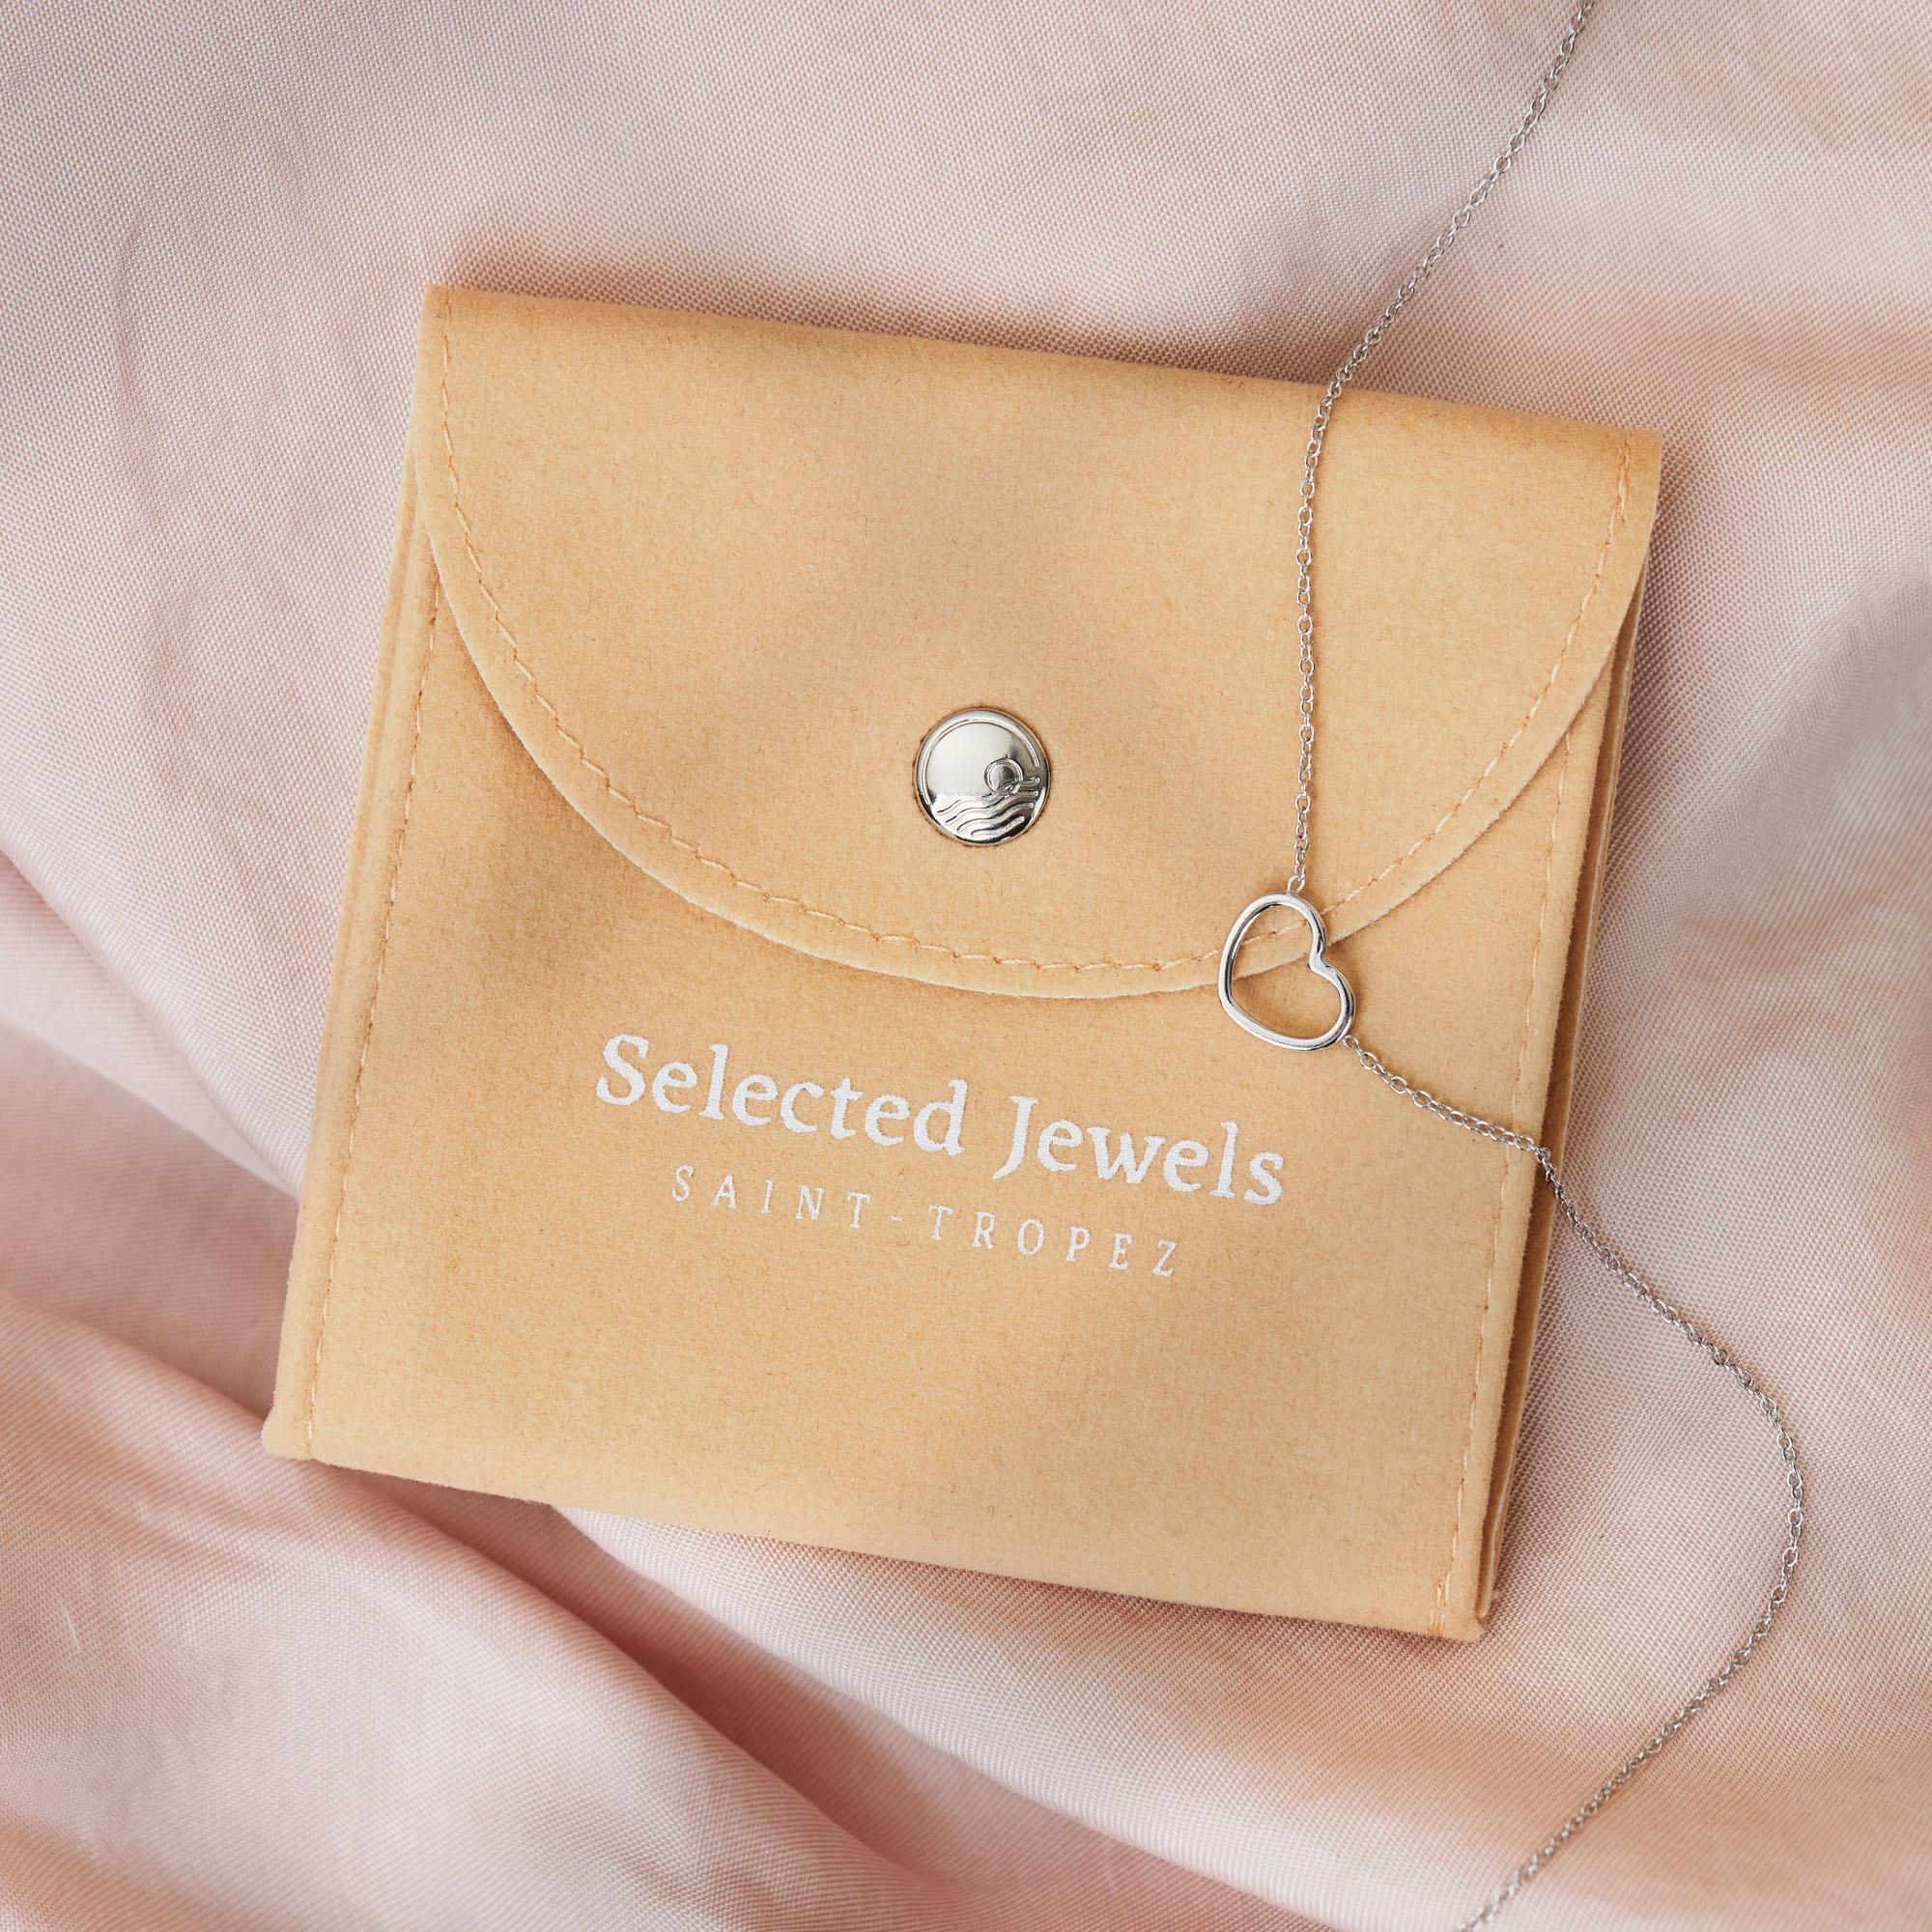 Selected Jewels Léna Joy ear cuff simple couleur or en argent sterling 925